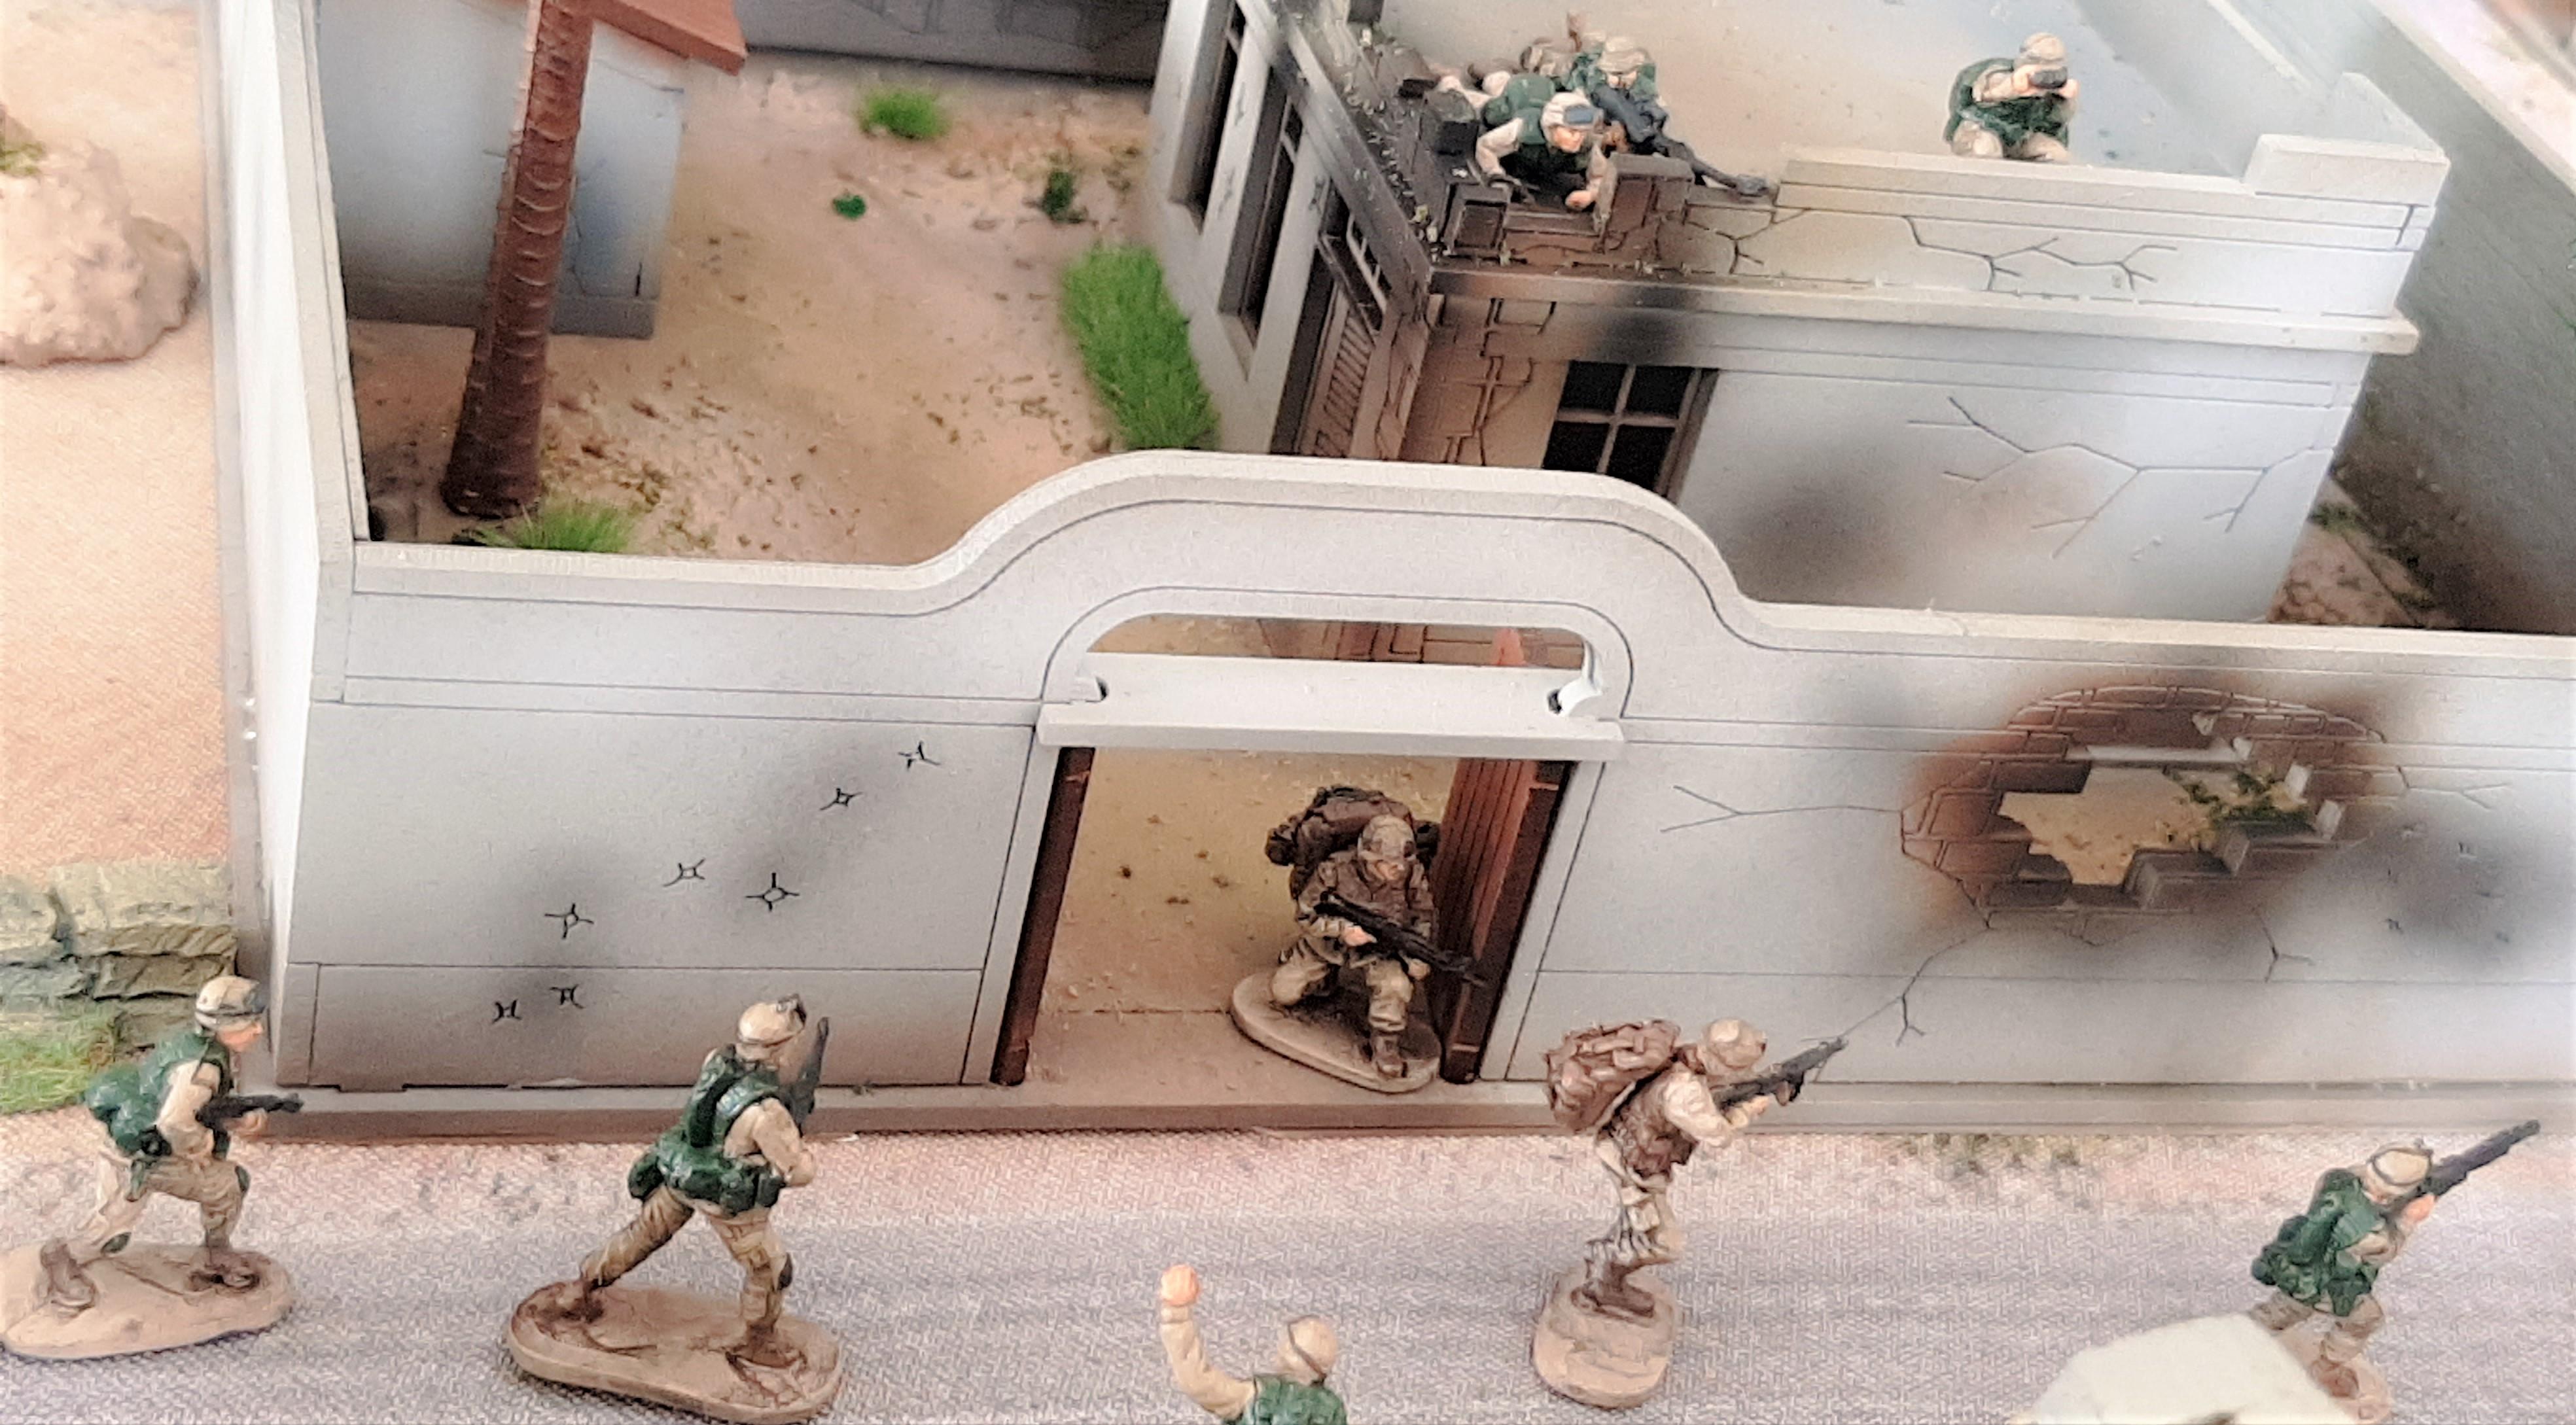 Diorama/Wargame Afghanistan 1/72 N5grj46